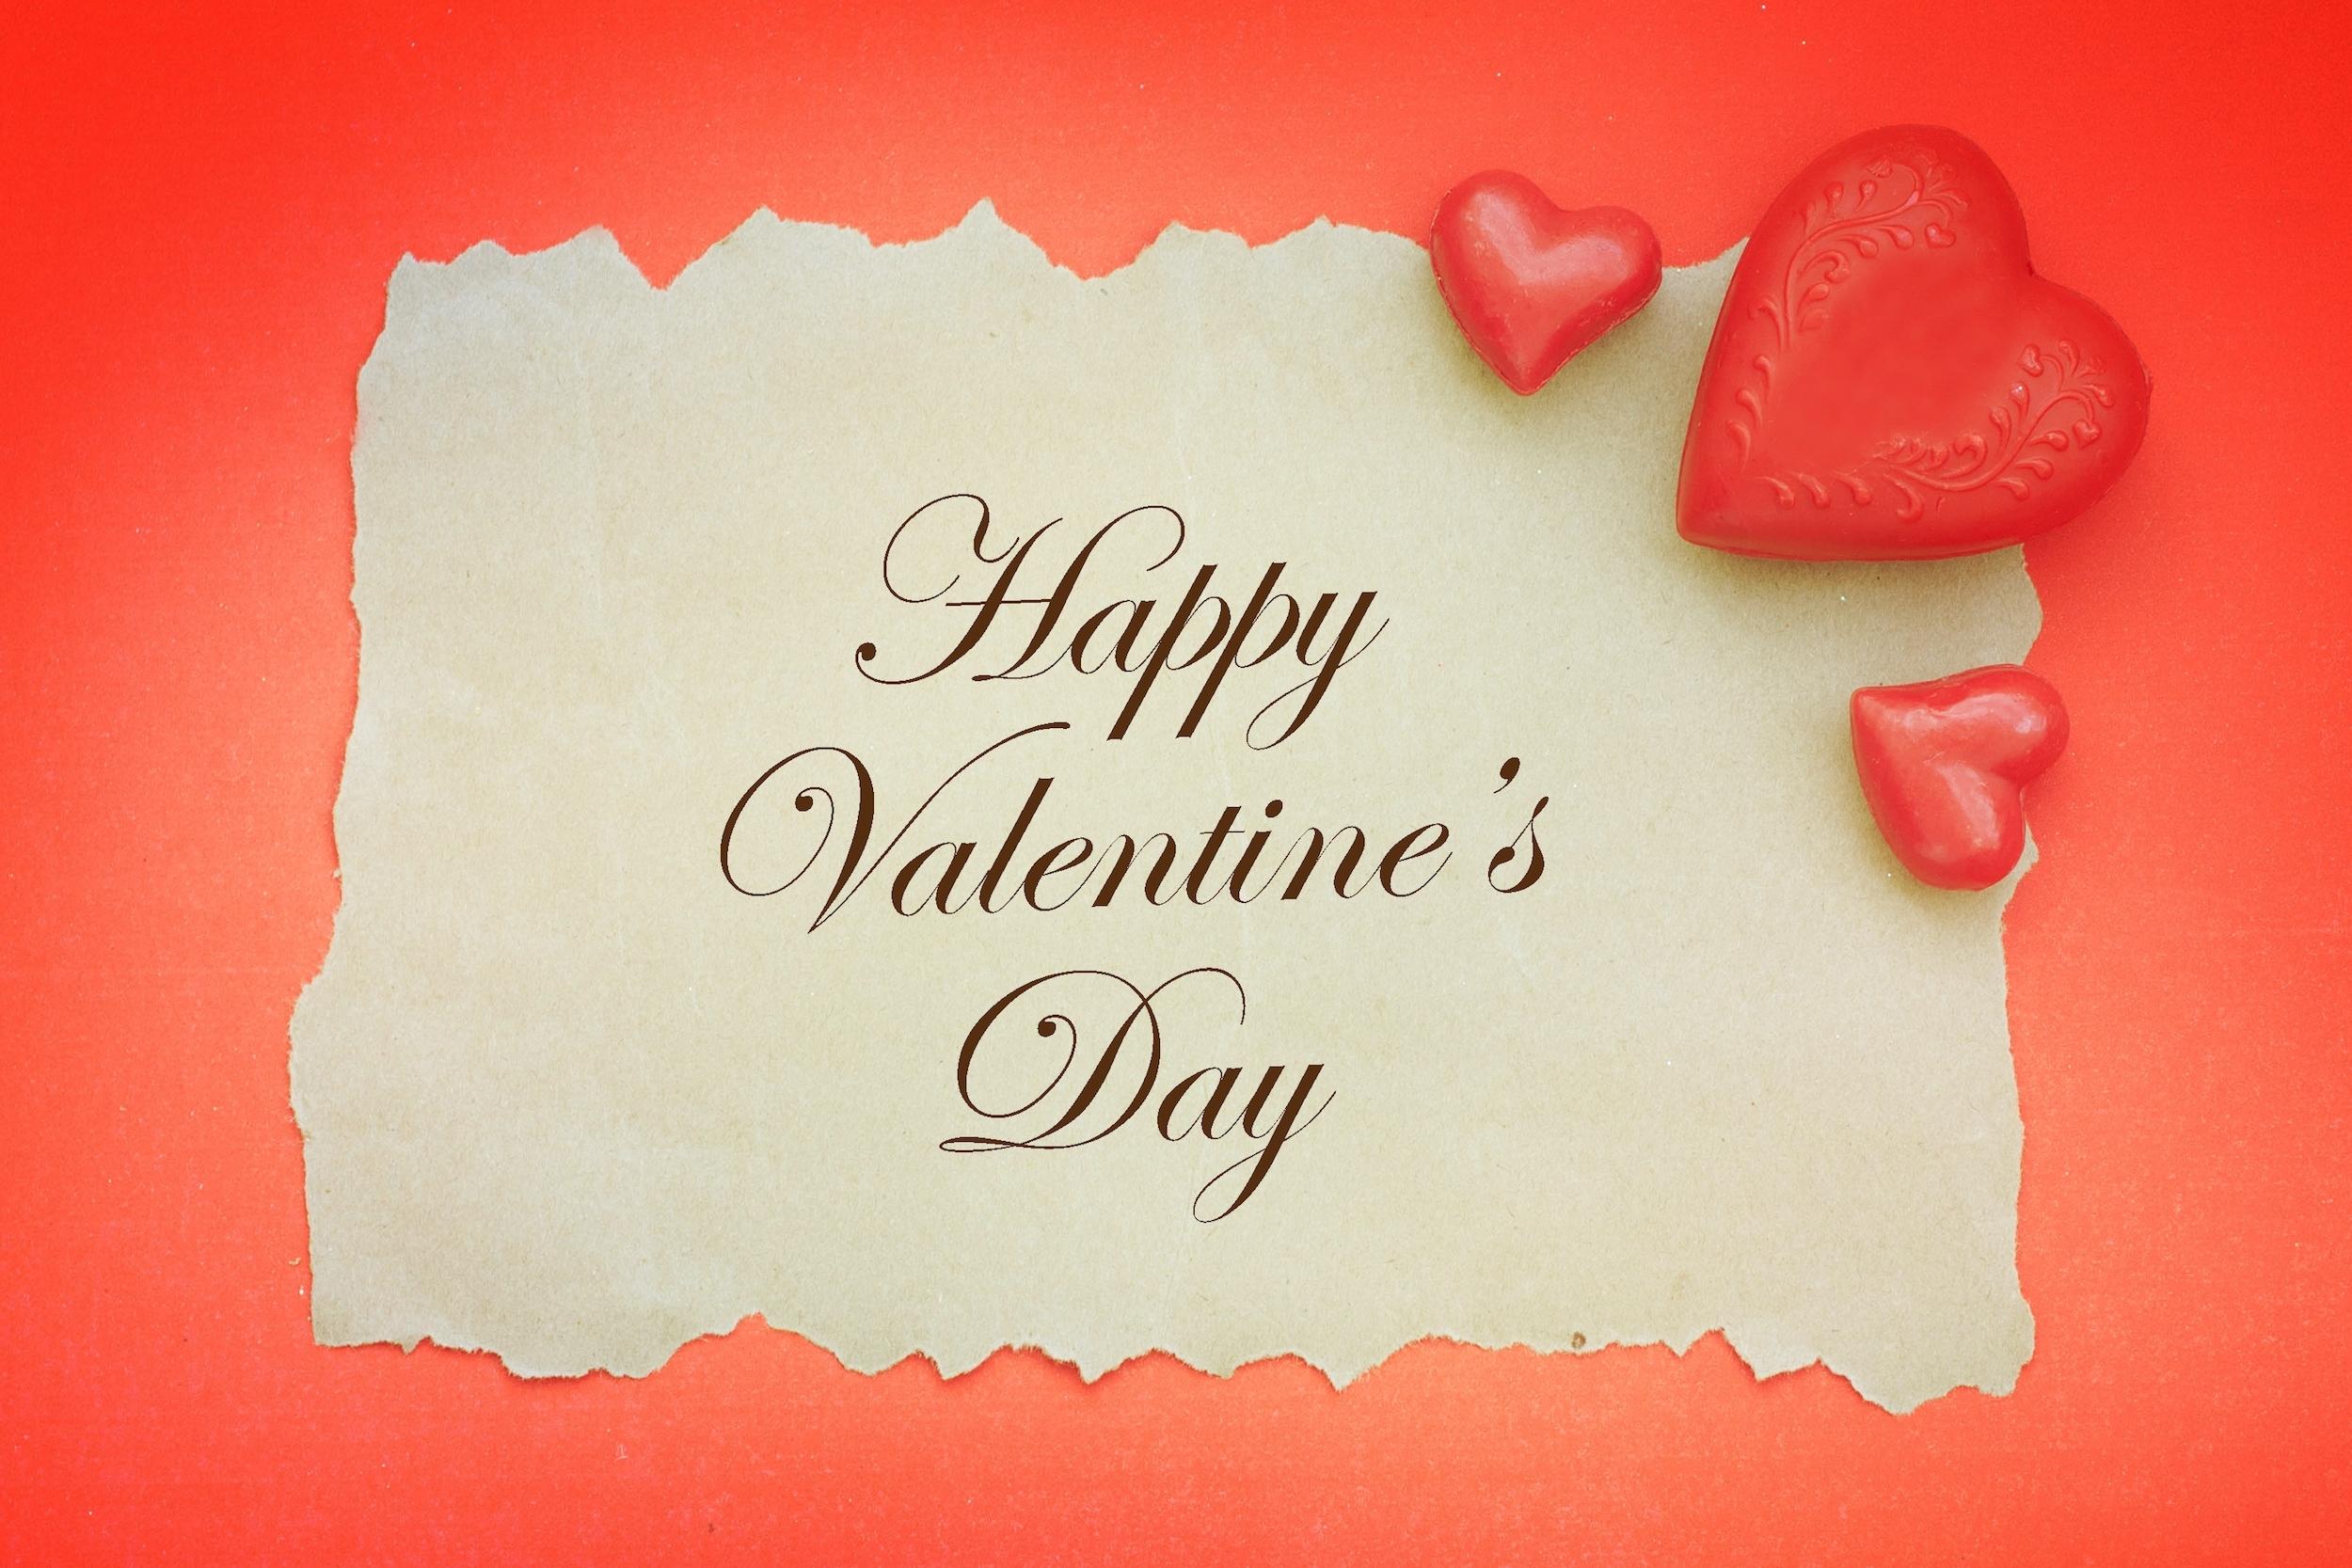 64365090fd19888f5bd0_Valentine_s_Day.jpg